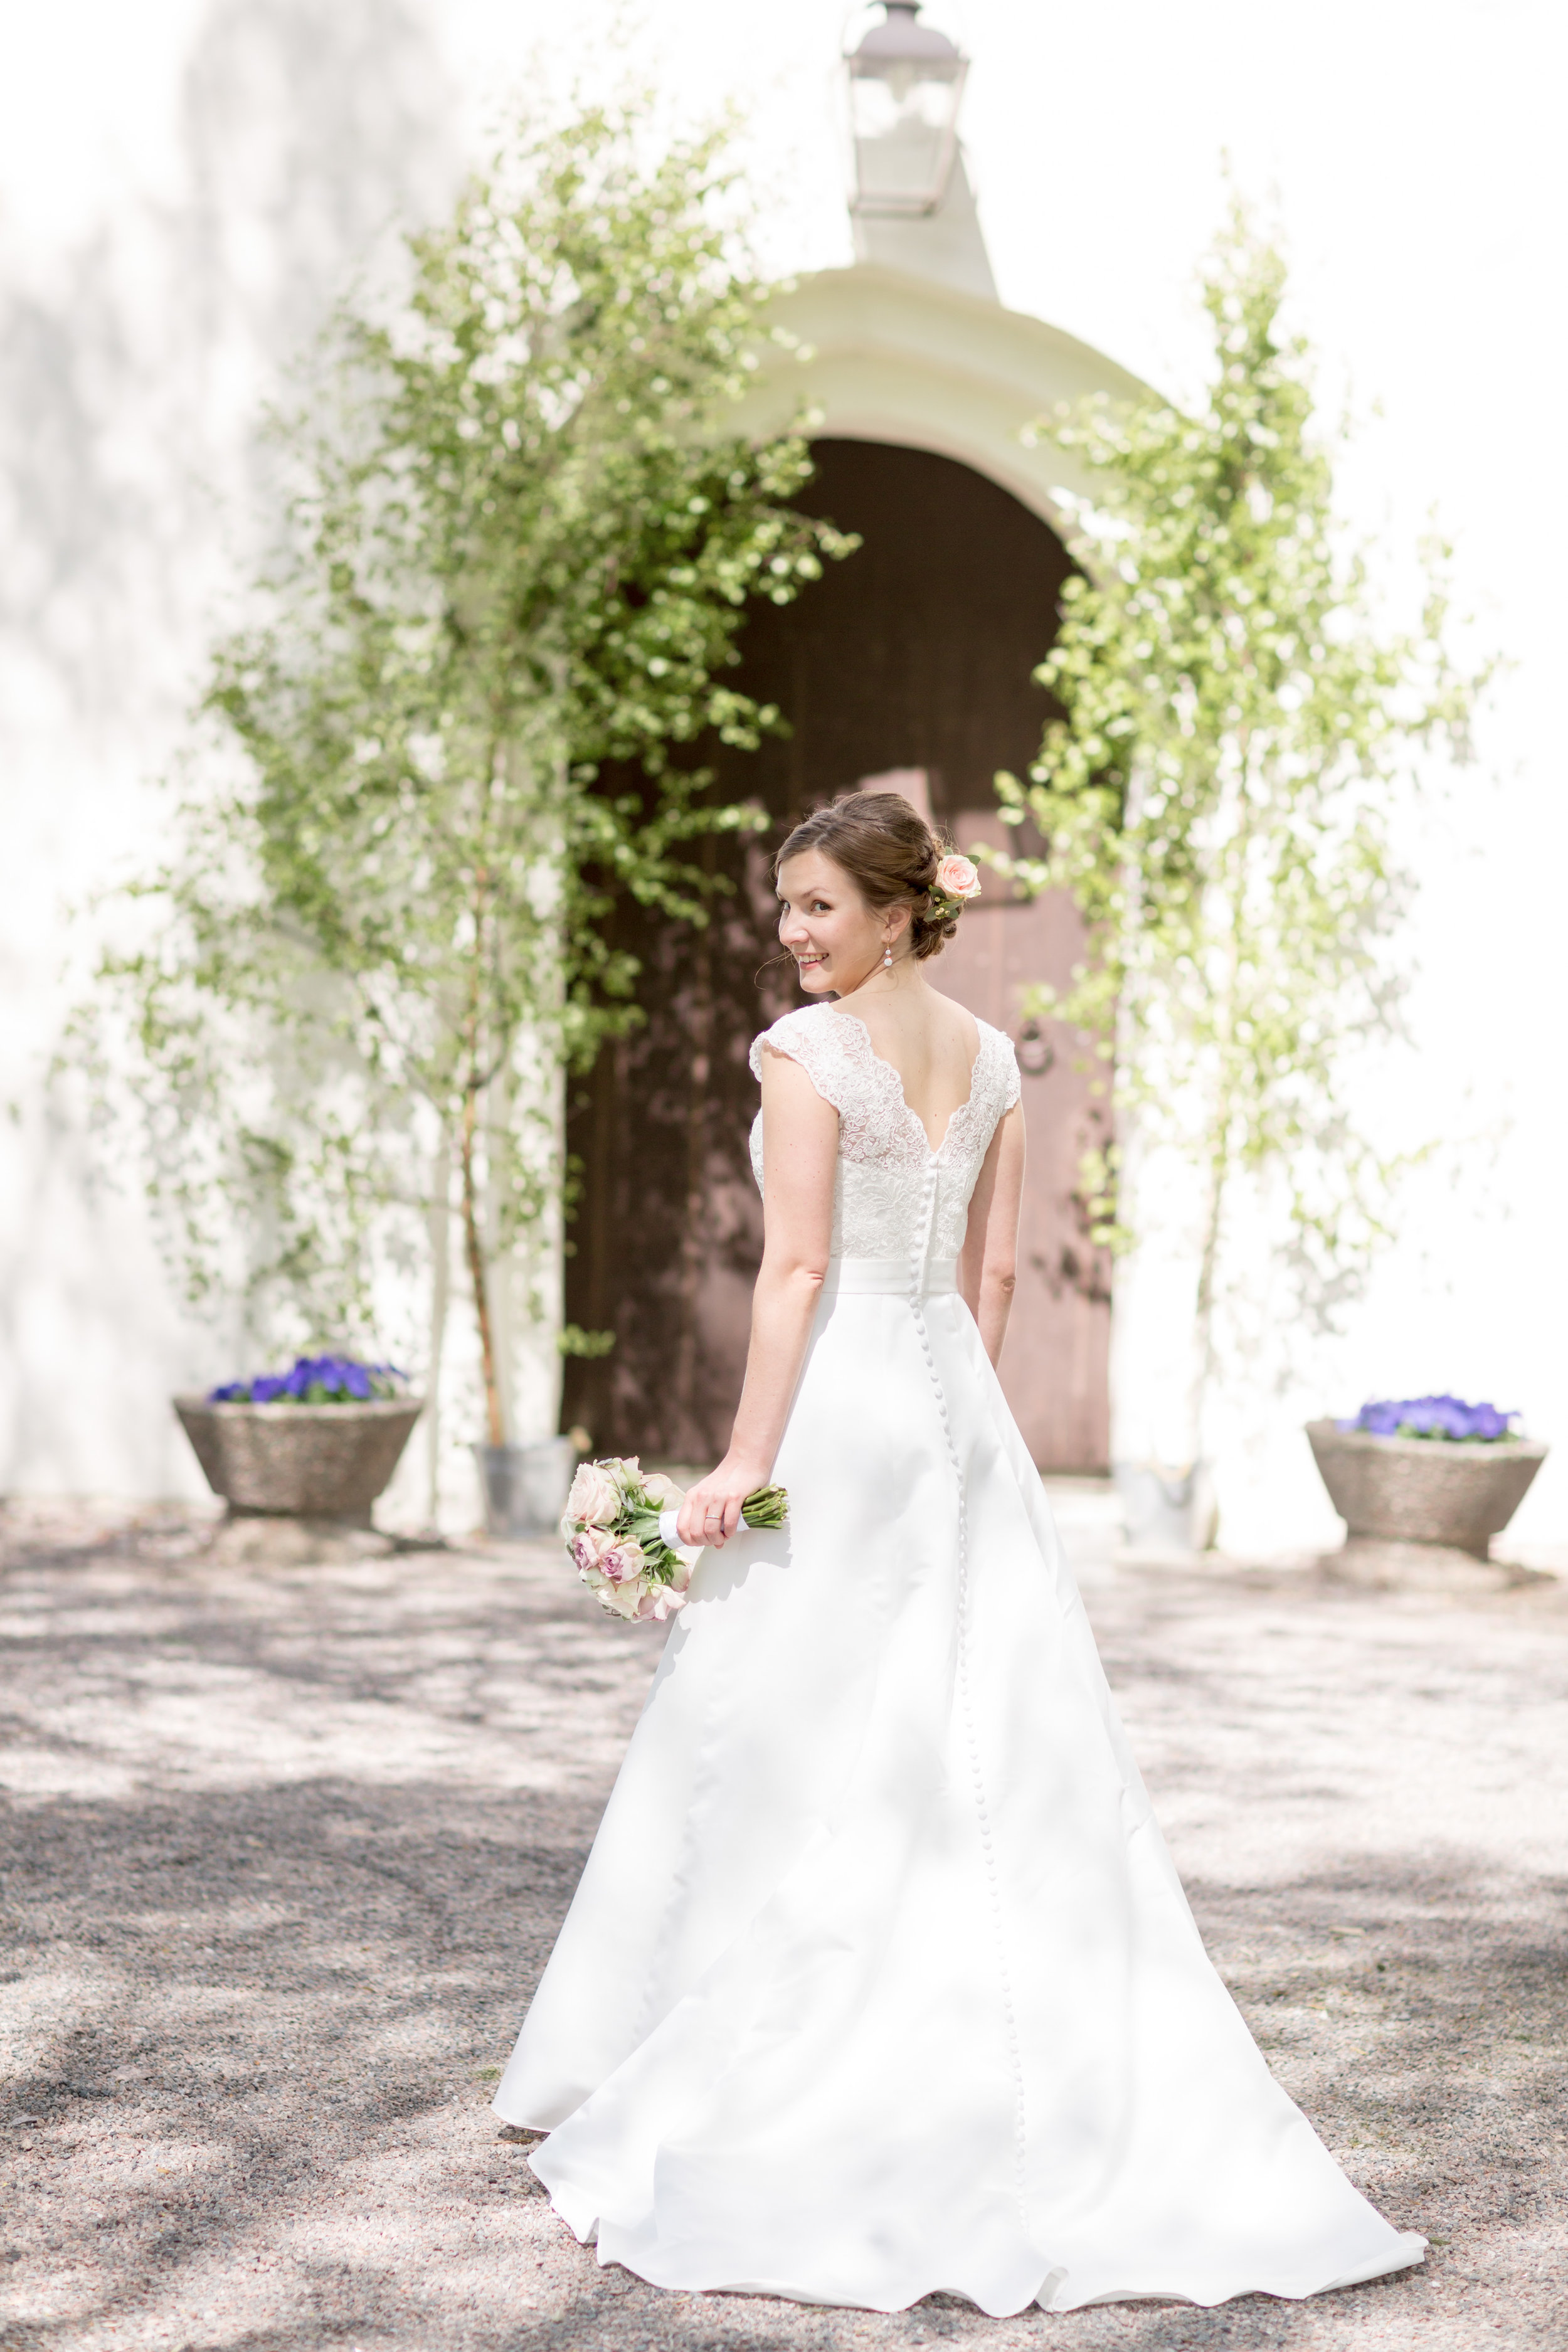 San Diego Wedding and Destination Wedding Photography Blessed Weddings 59.jpg